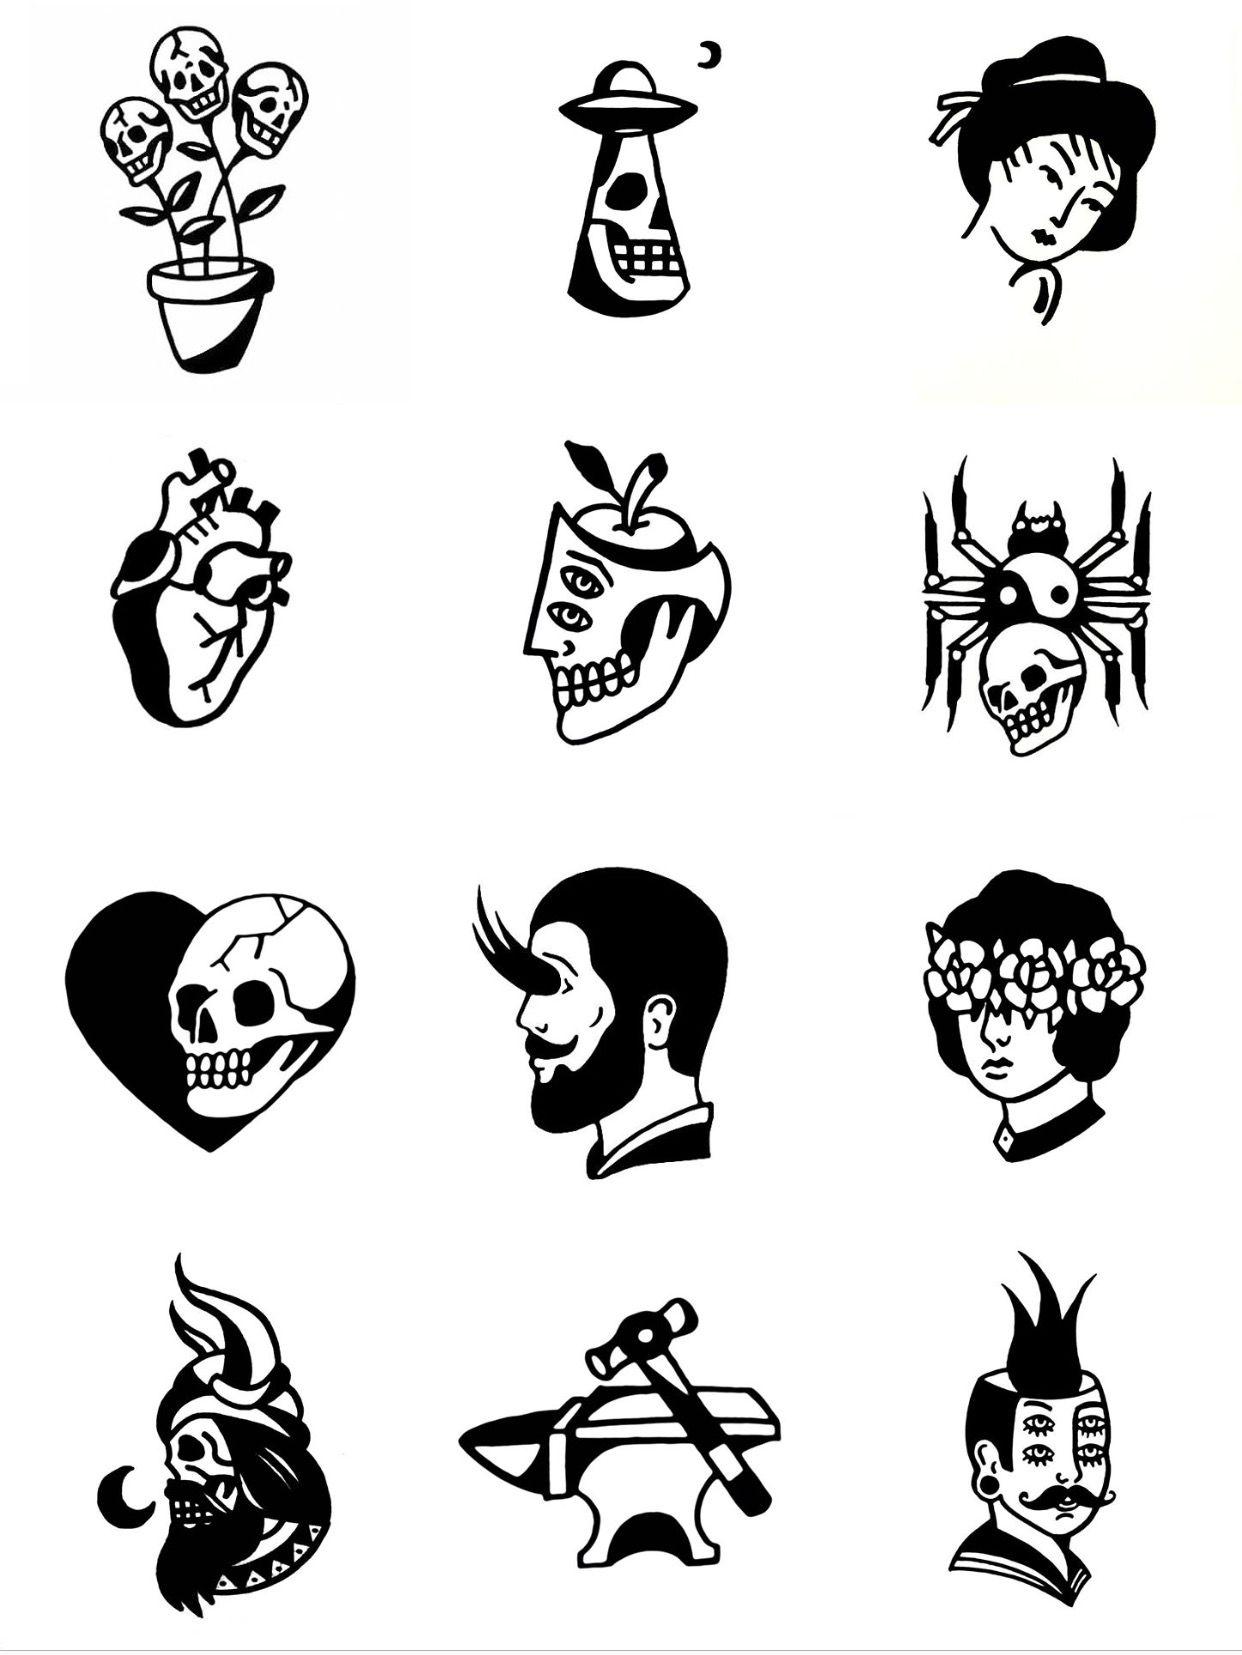 Pin By Jan Jd On Drawings Tatuajes Tradicionales Tatuaje